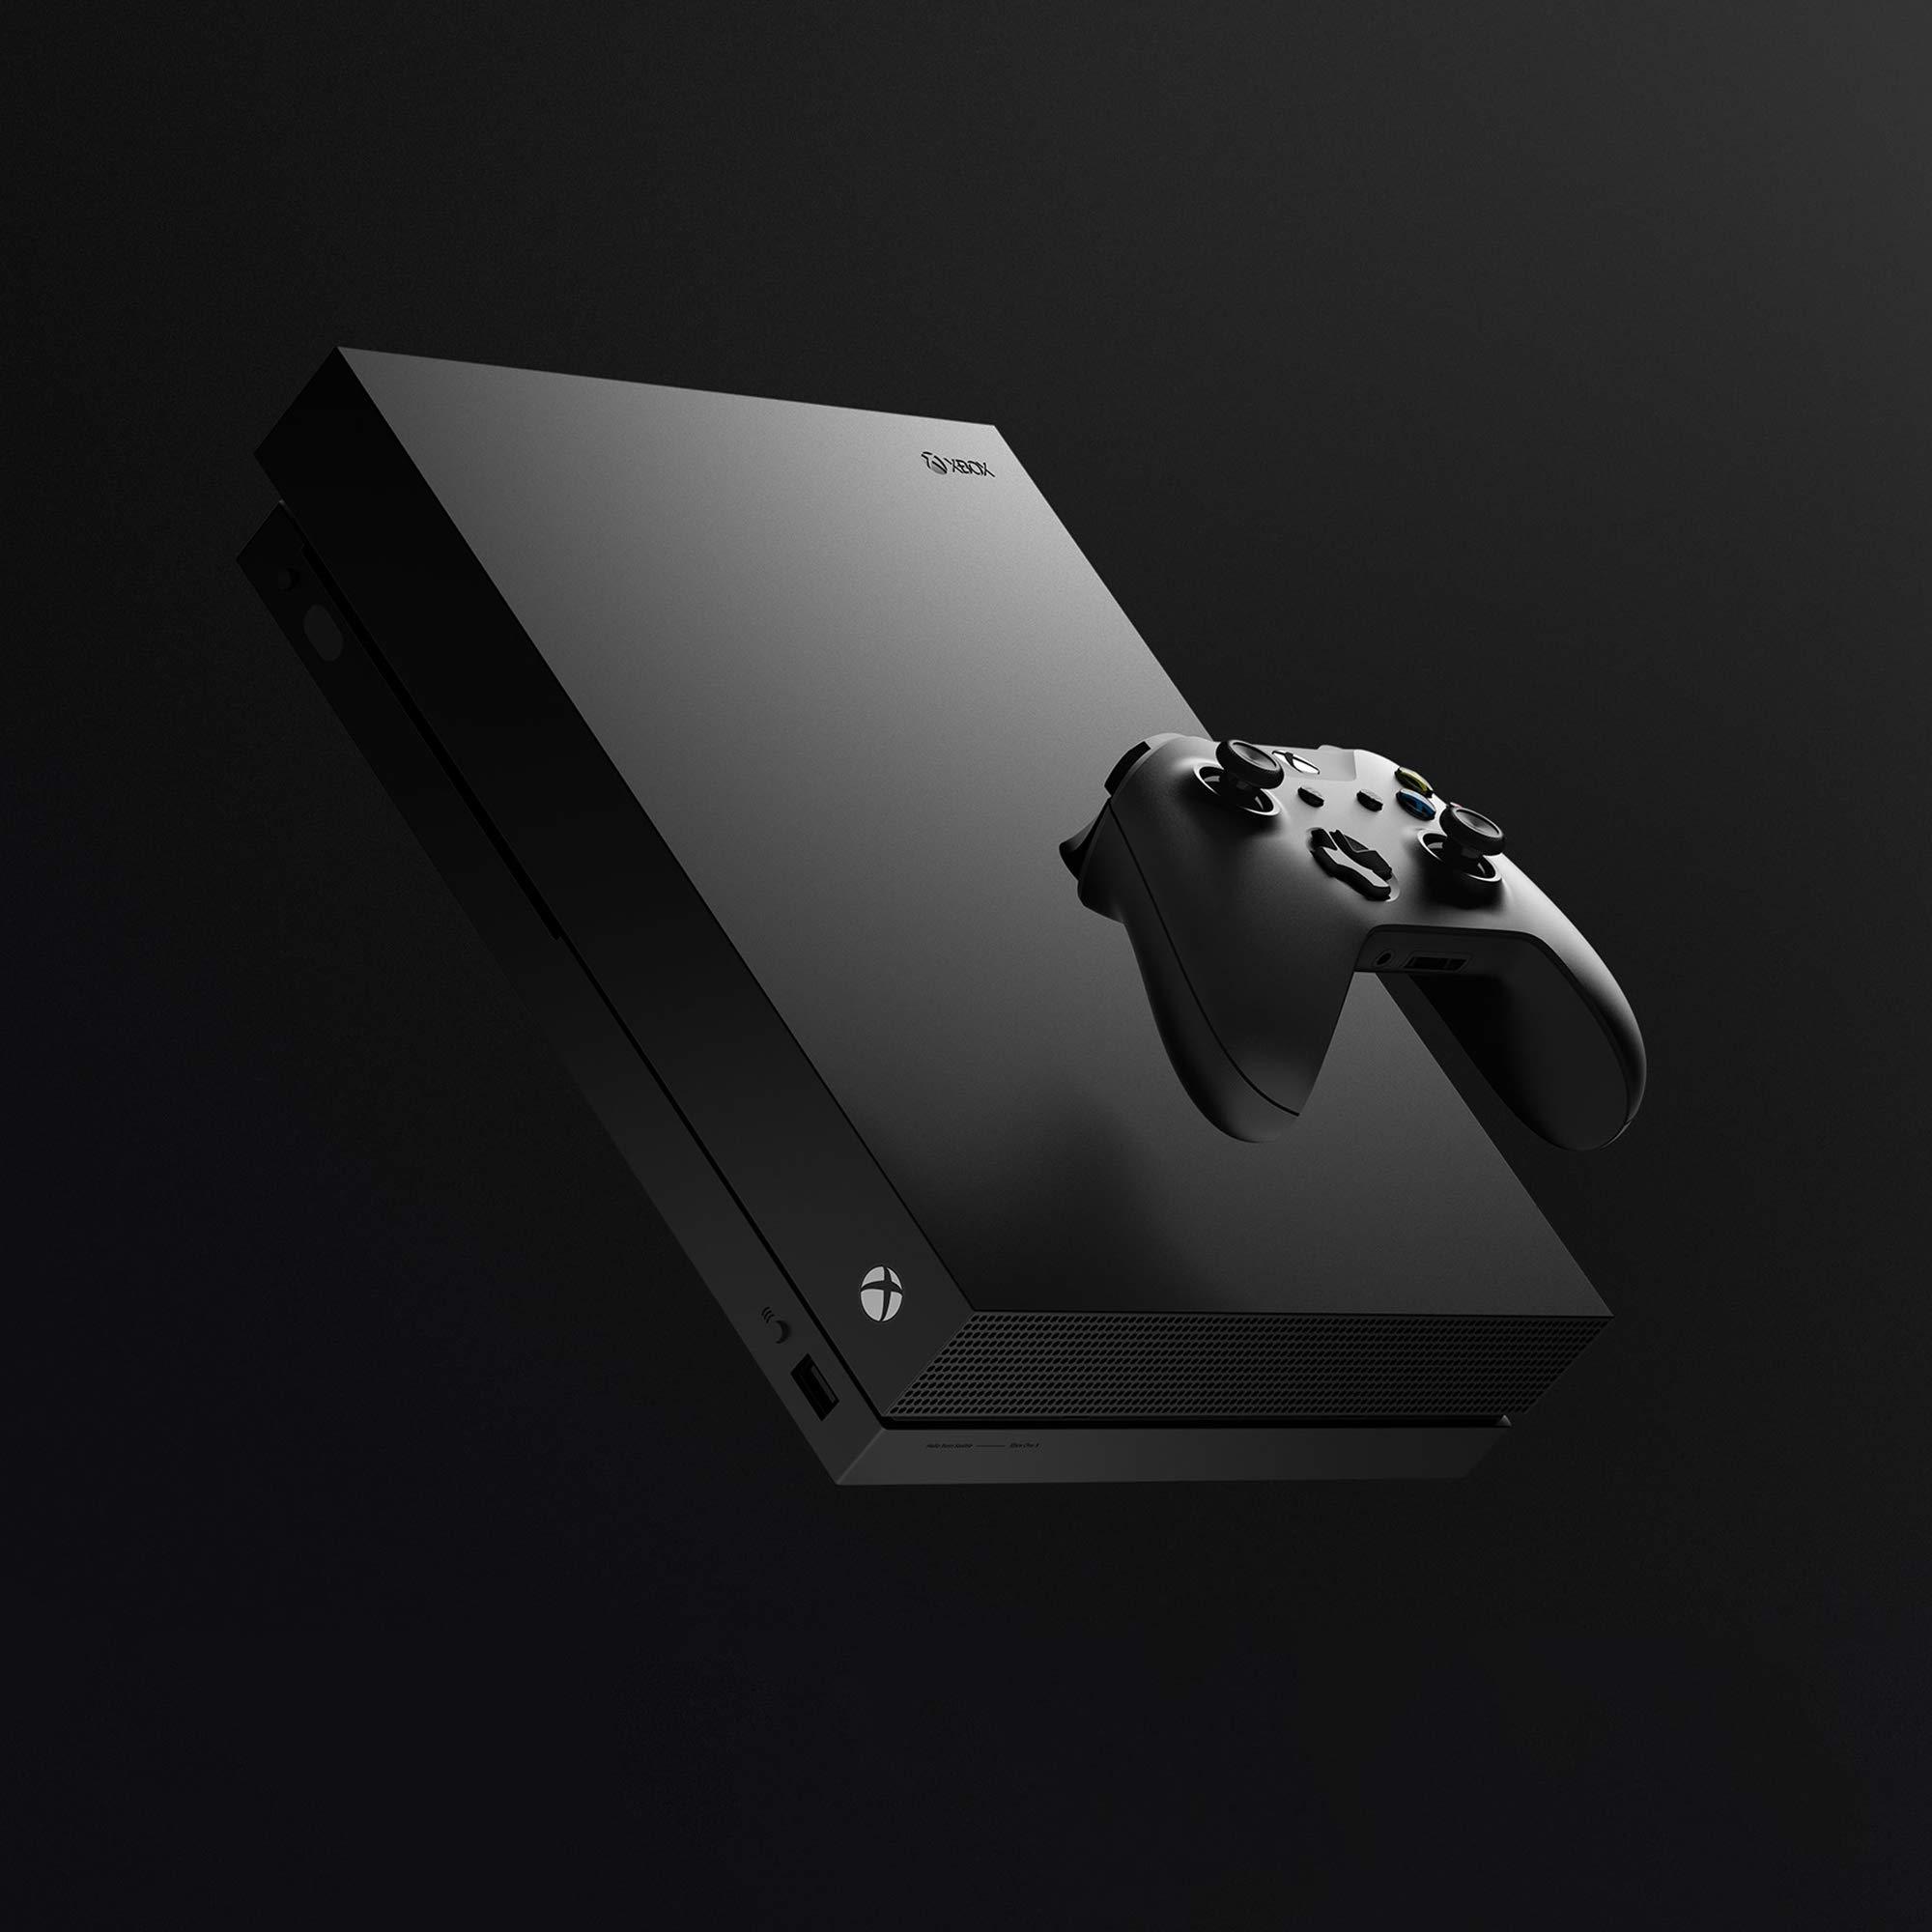 Microsoft Xbox One X - Consola 1TB 4K HDR Negro + Mando Inalámbrico, Color Negro Bluetooth: Amazon.es: Videojuegos